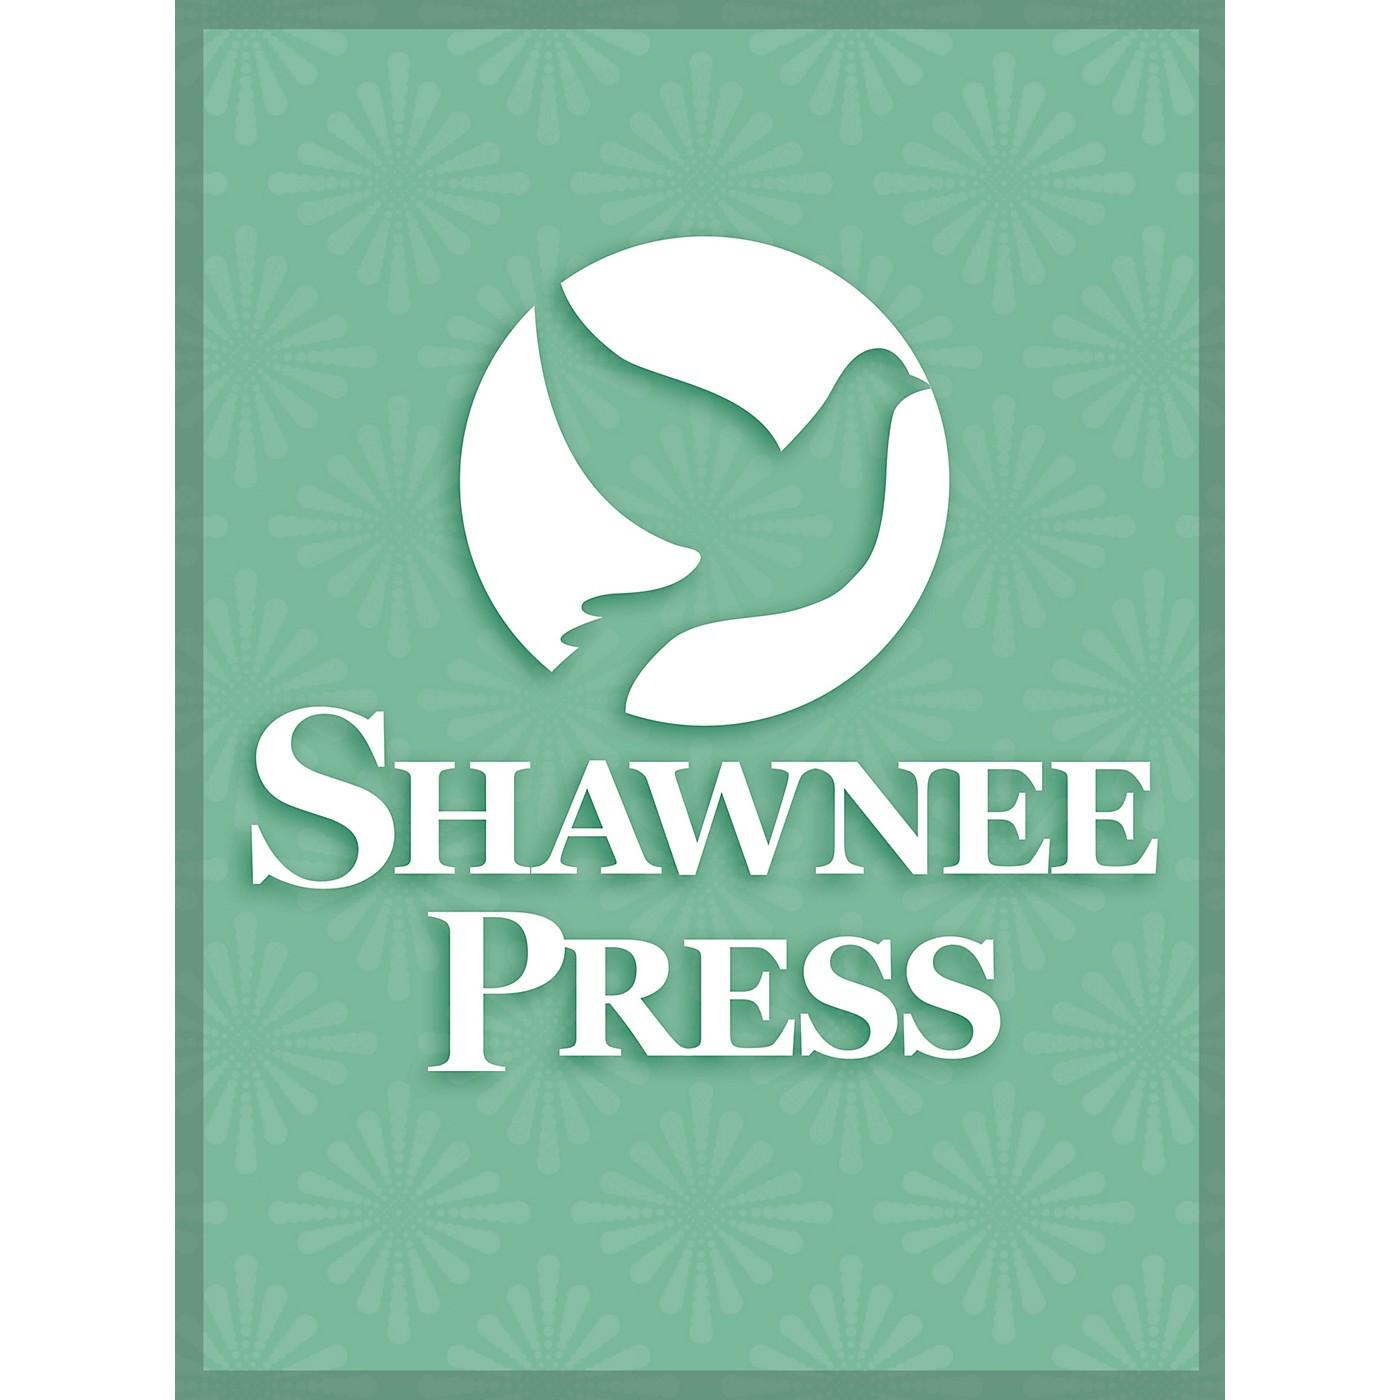 Shawnee Press Three Early American Hymn Tunes (3-5 Octaves of Handbells Level 2) HANDBELLS (2-3) by Sharon Elery Rogers thumbnail